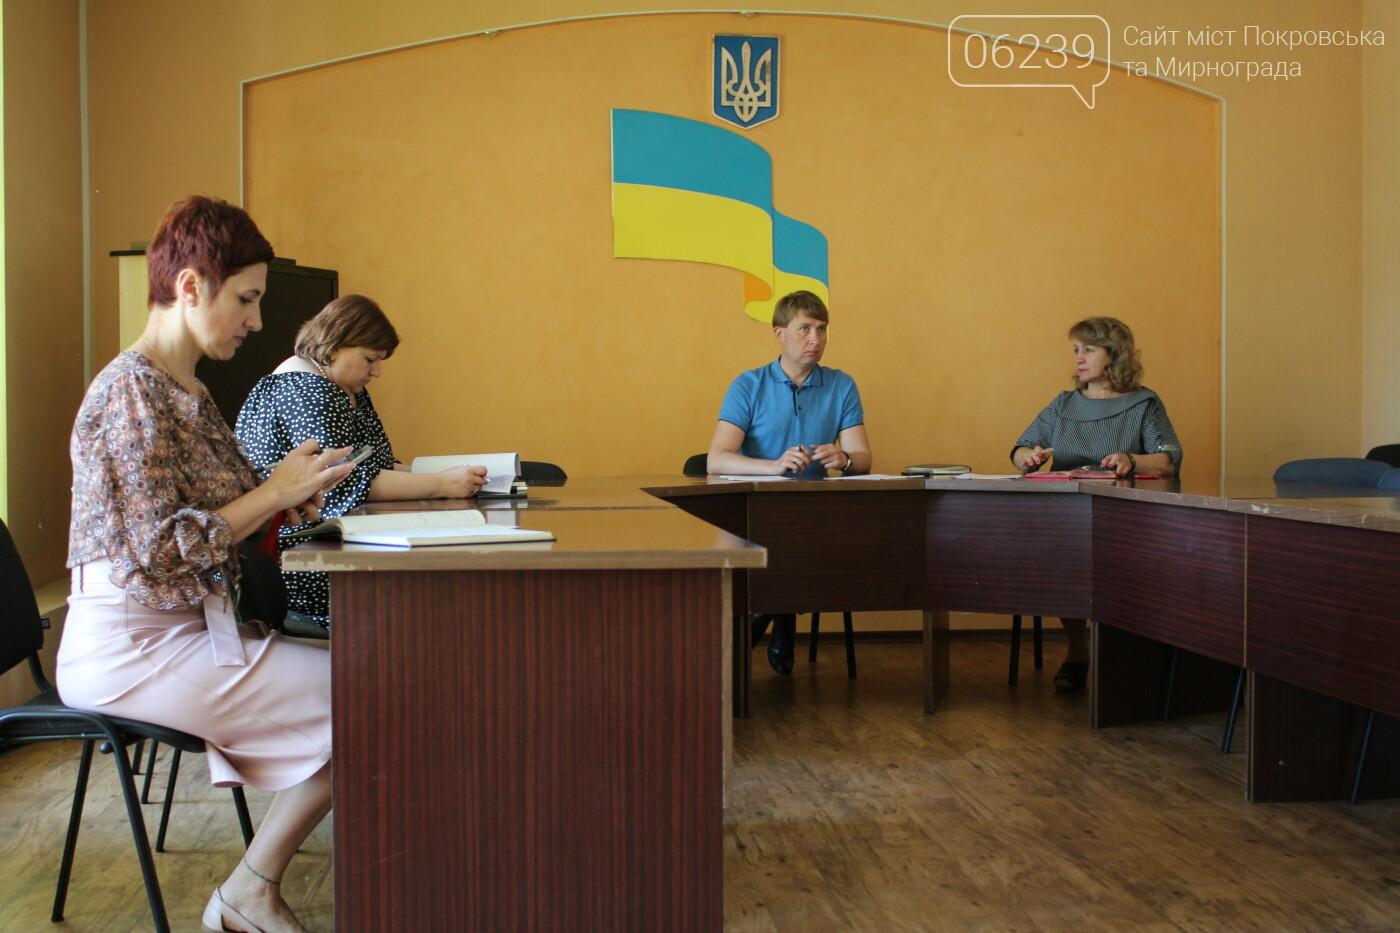 В Мирнограде отчитали предприятия, которые не следят за закреплёнными территориями, фото-1